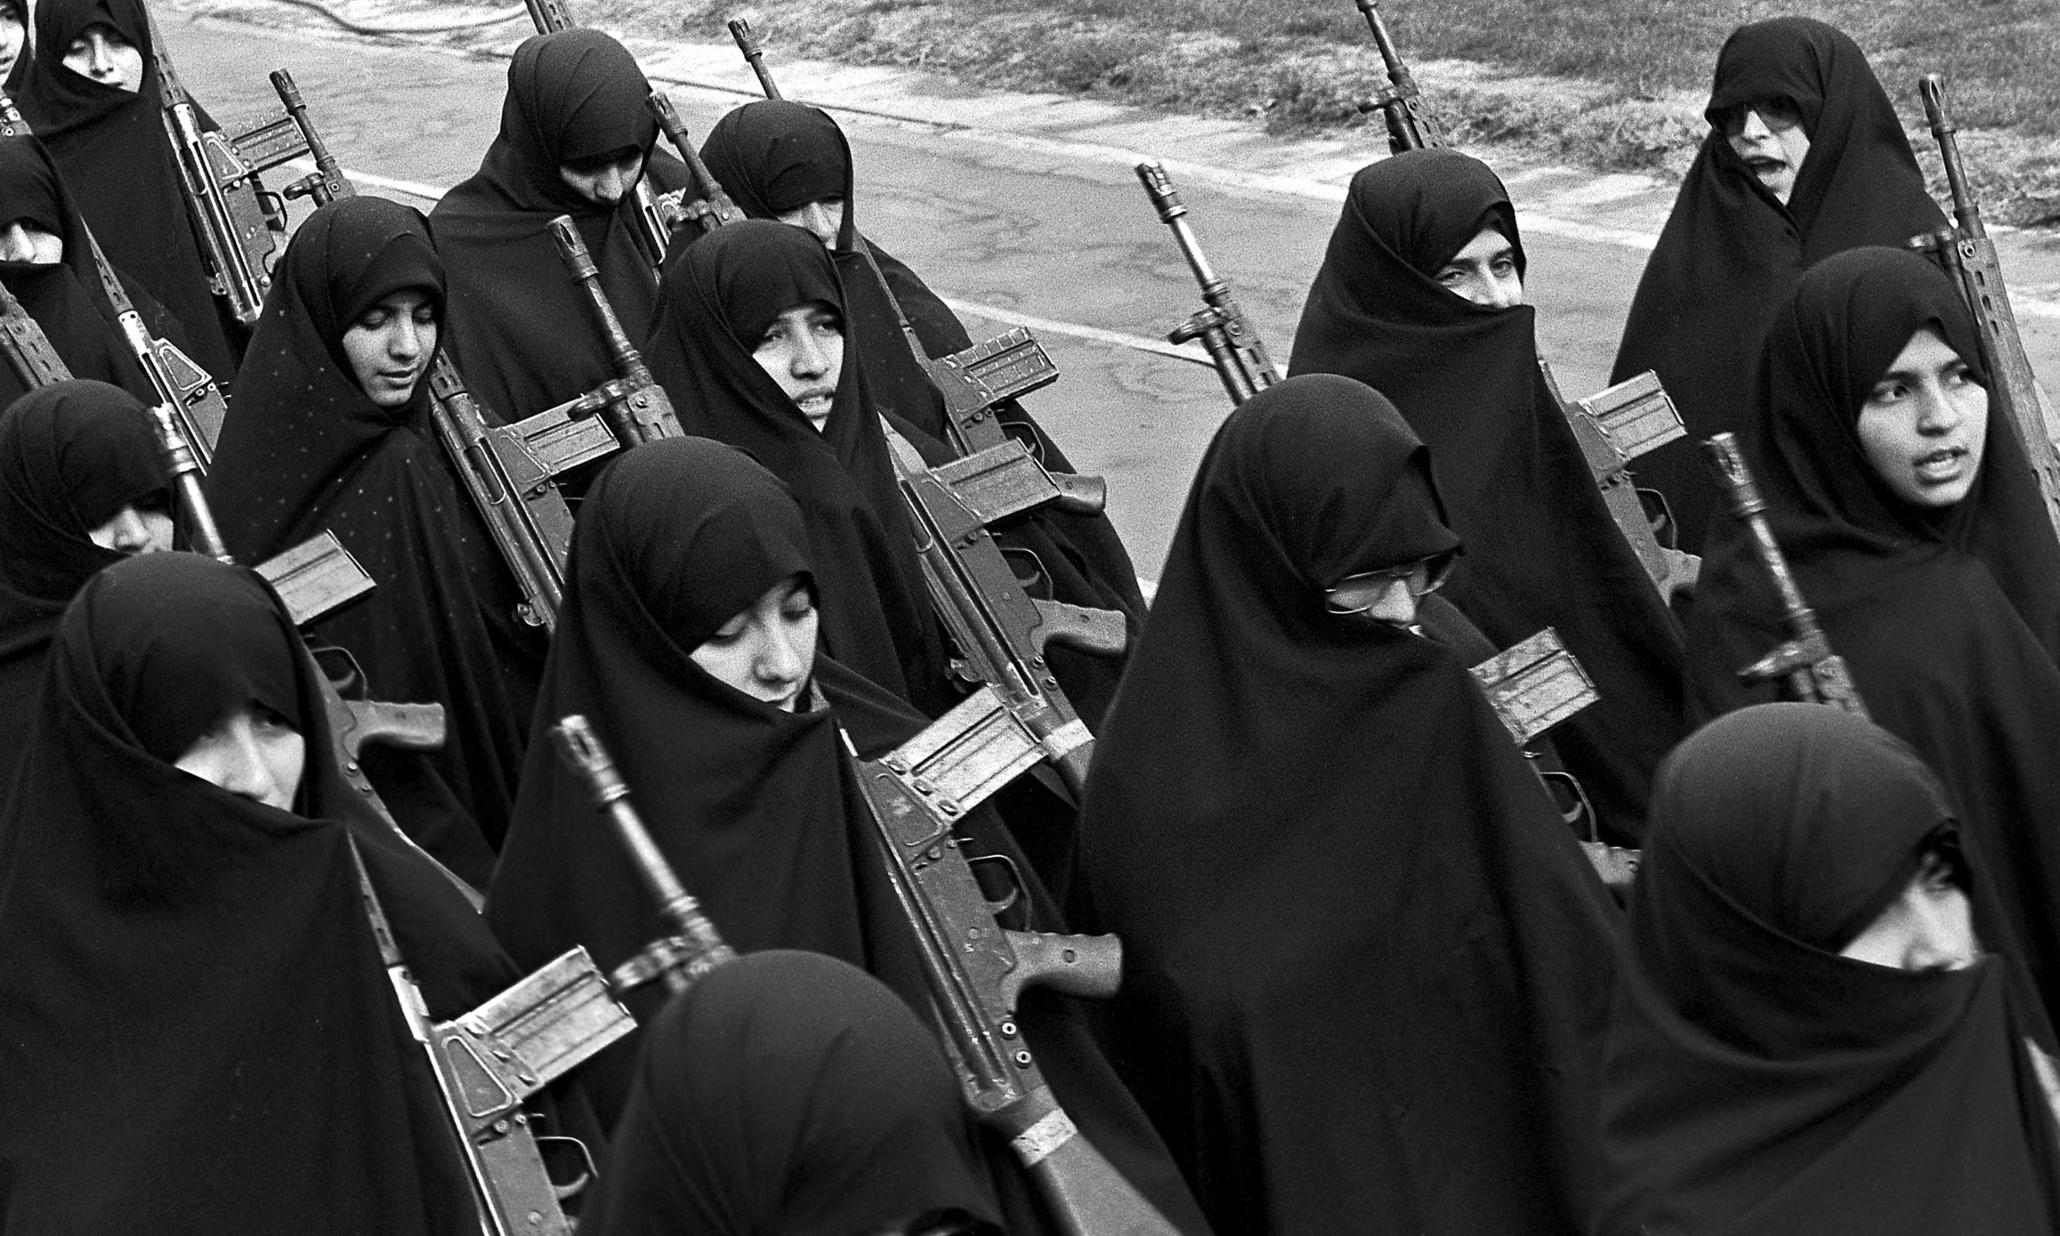 İran - Irak Savaşı 1980 12